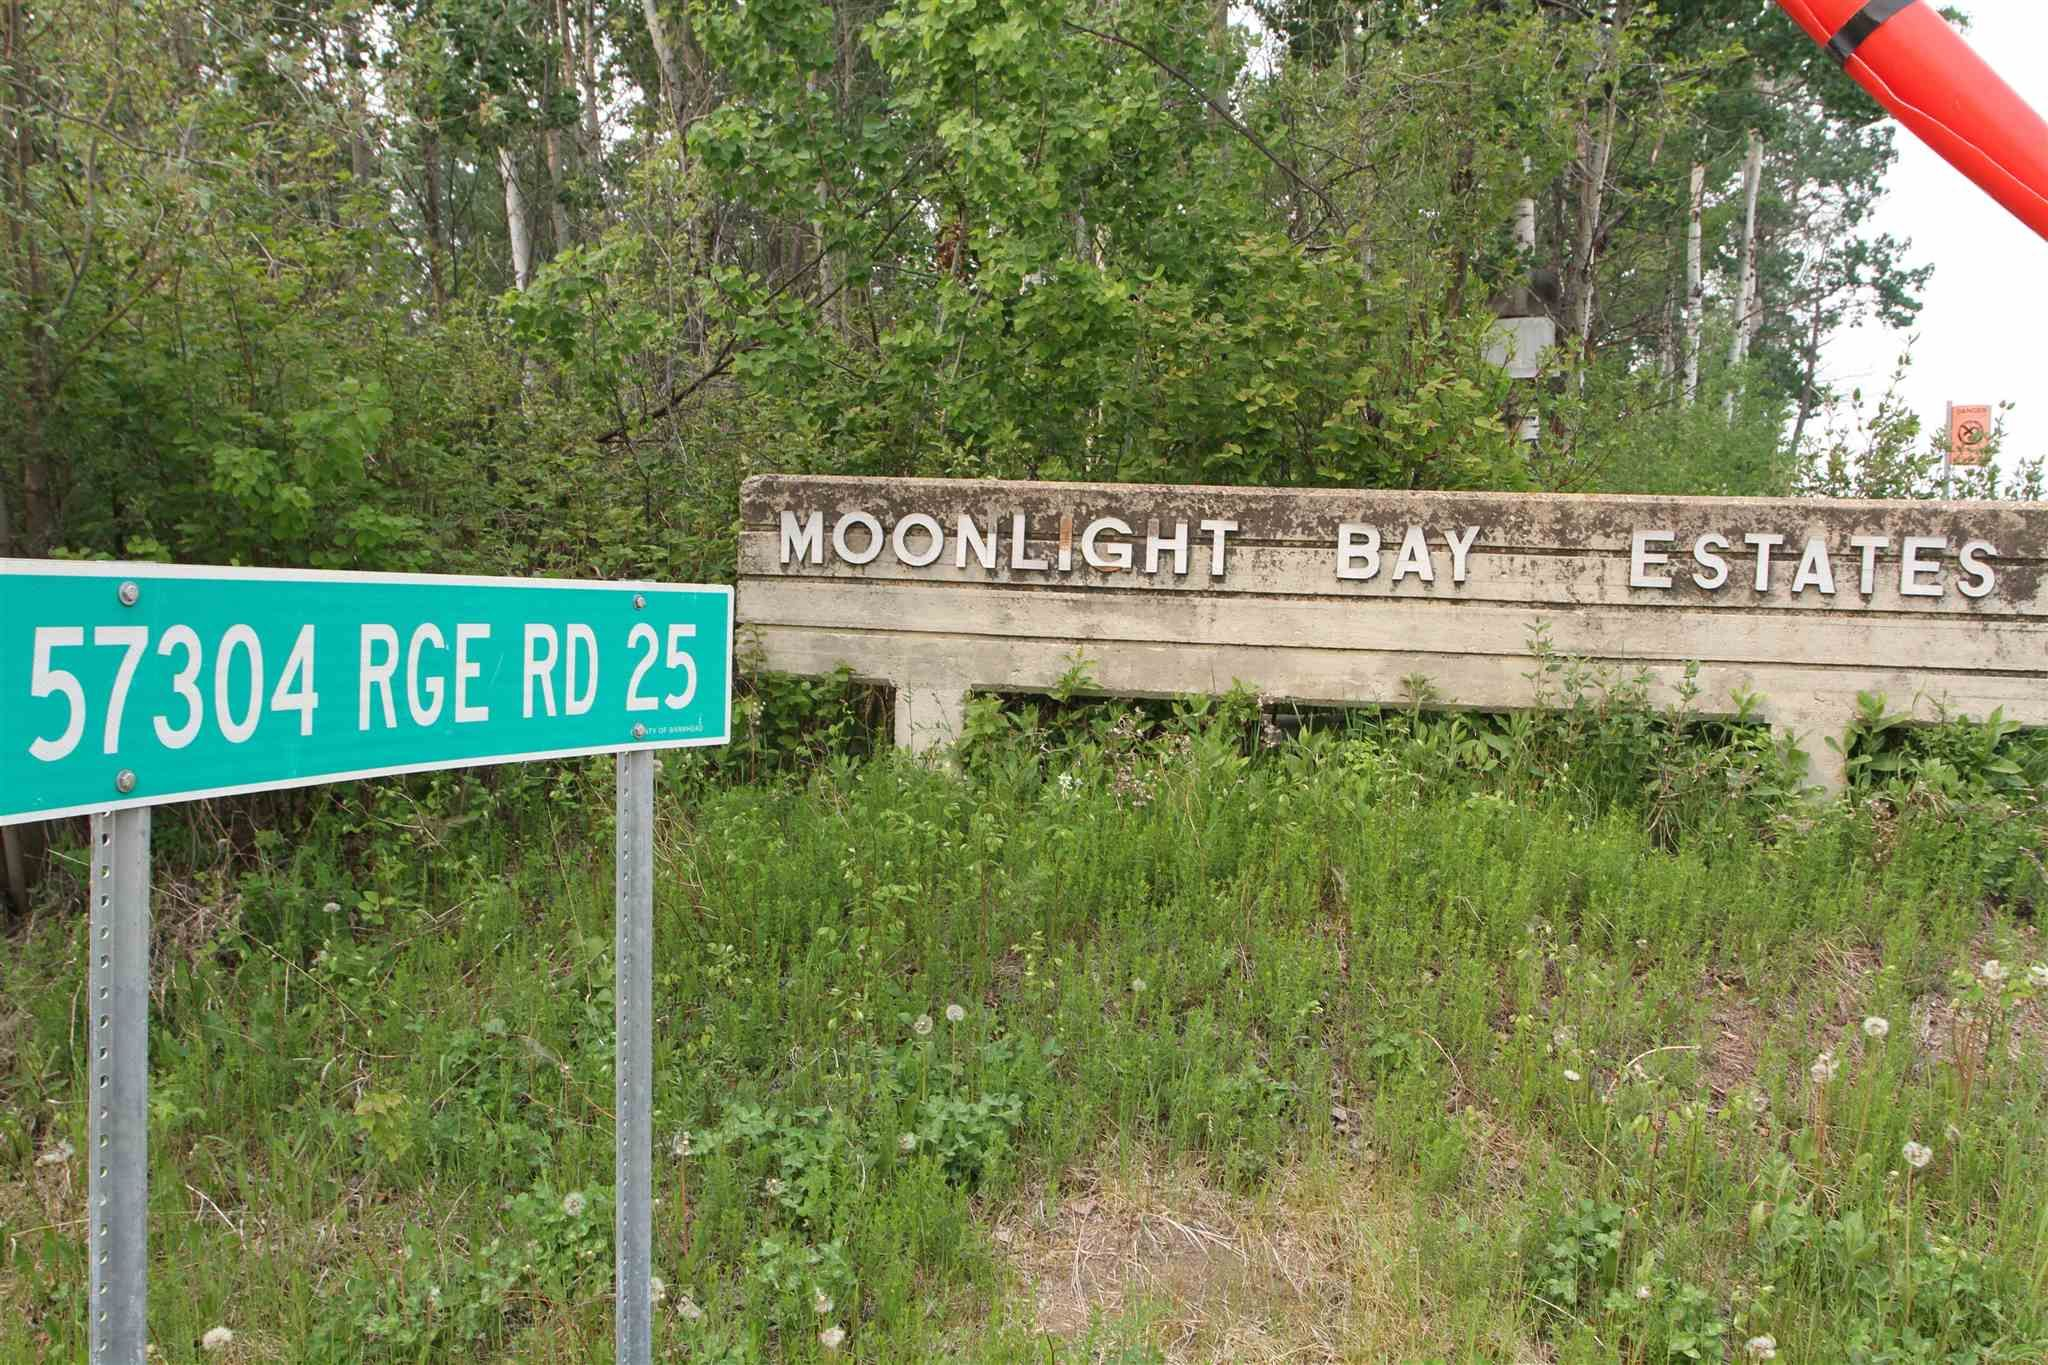 Main Photo: 607 57304 Range Road 25: Rural Barrhead County Rural Land/Vacant Lot for sale : MLS®# E4248352